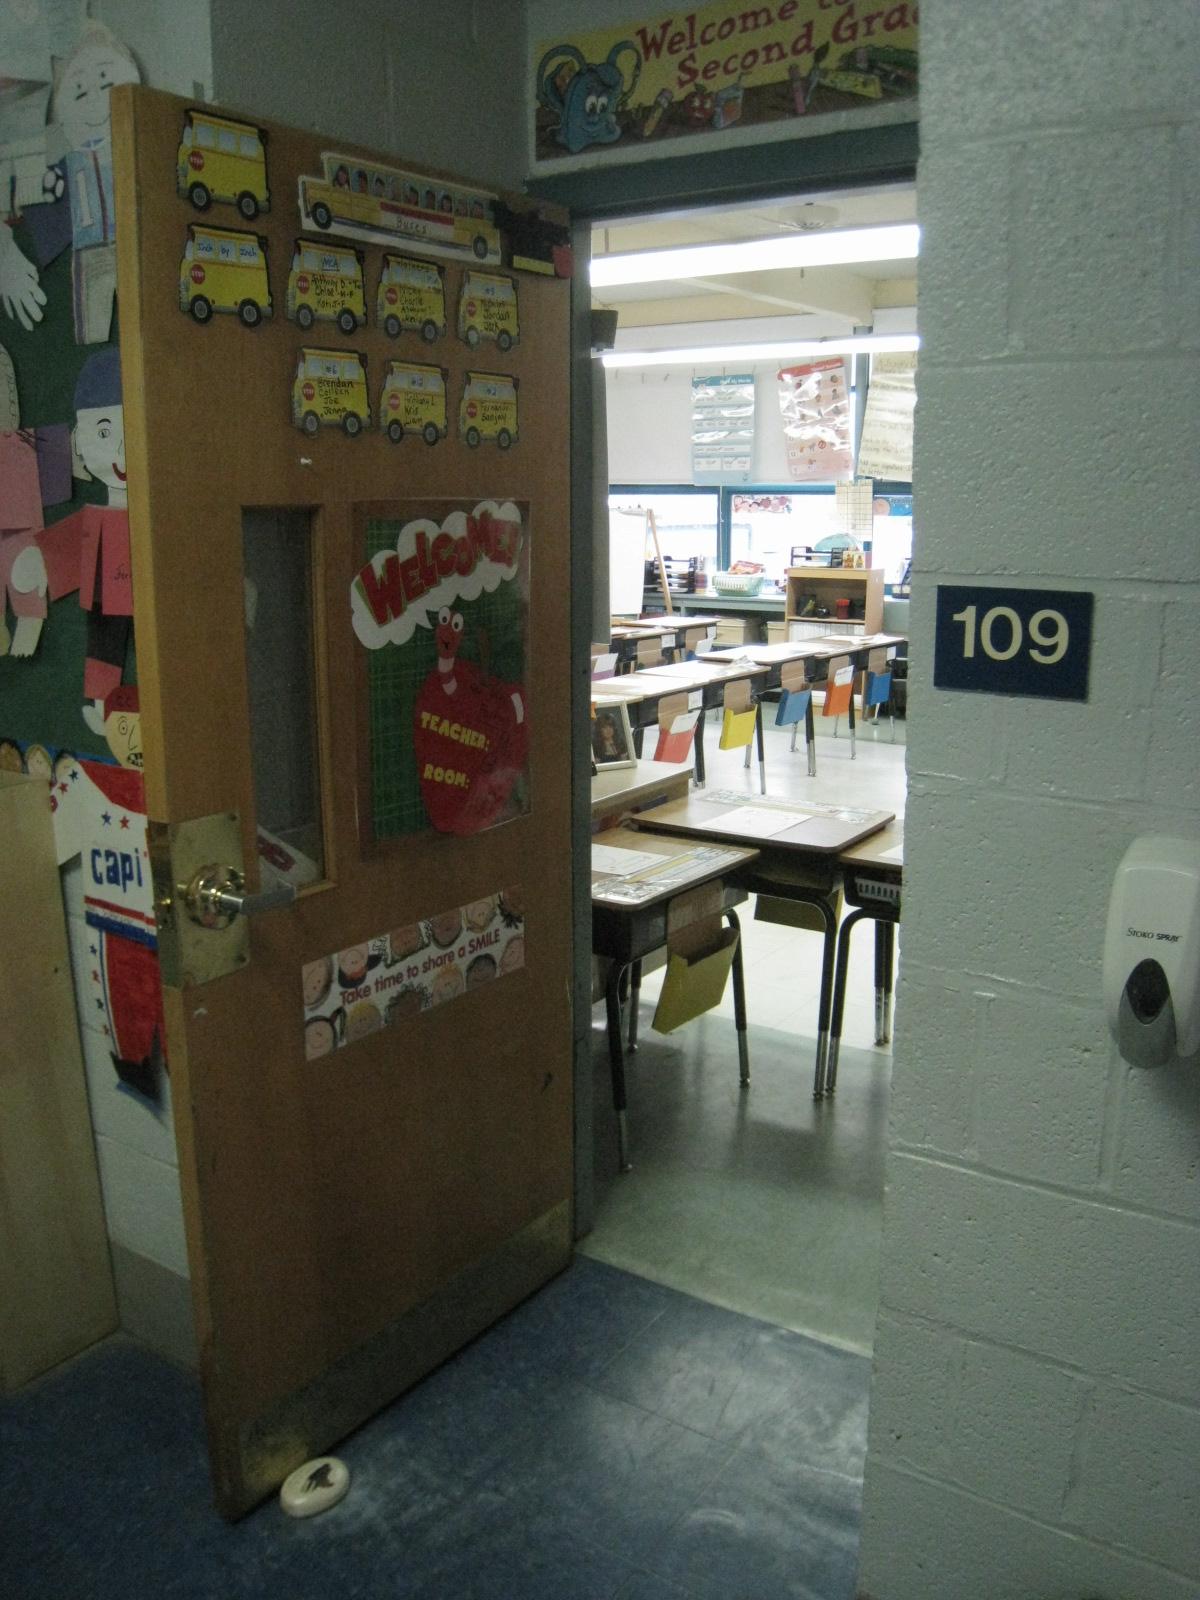 Room 109 Memorial School, Burlington MA